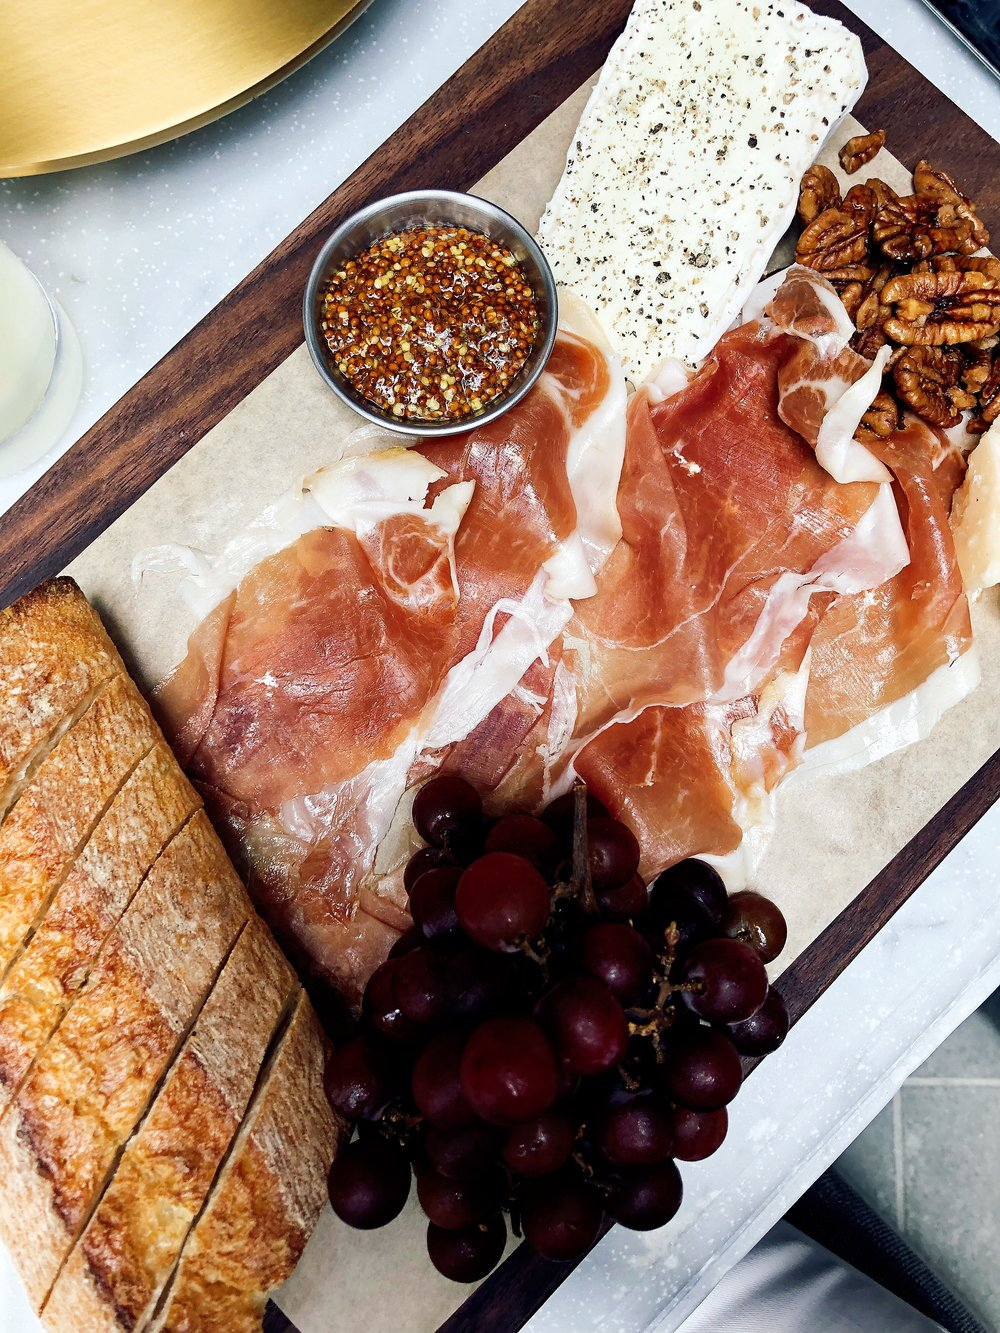 Delice De Bourgogne Cheese : Preserves, Pecans, Warm Baguette